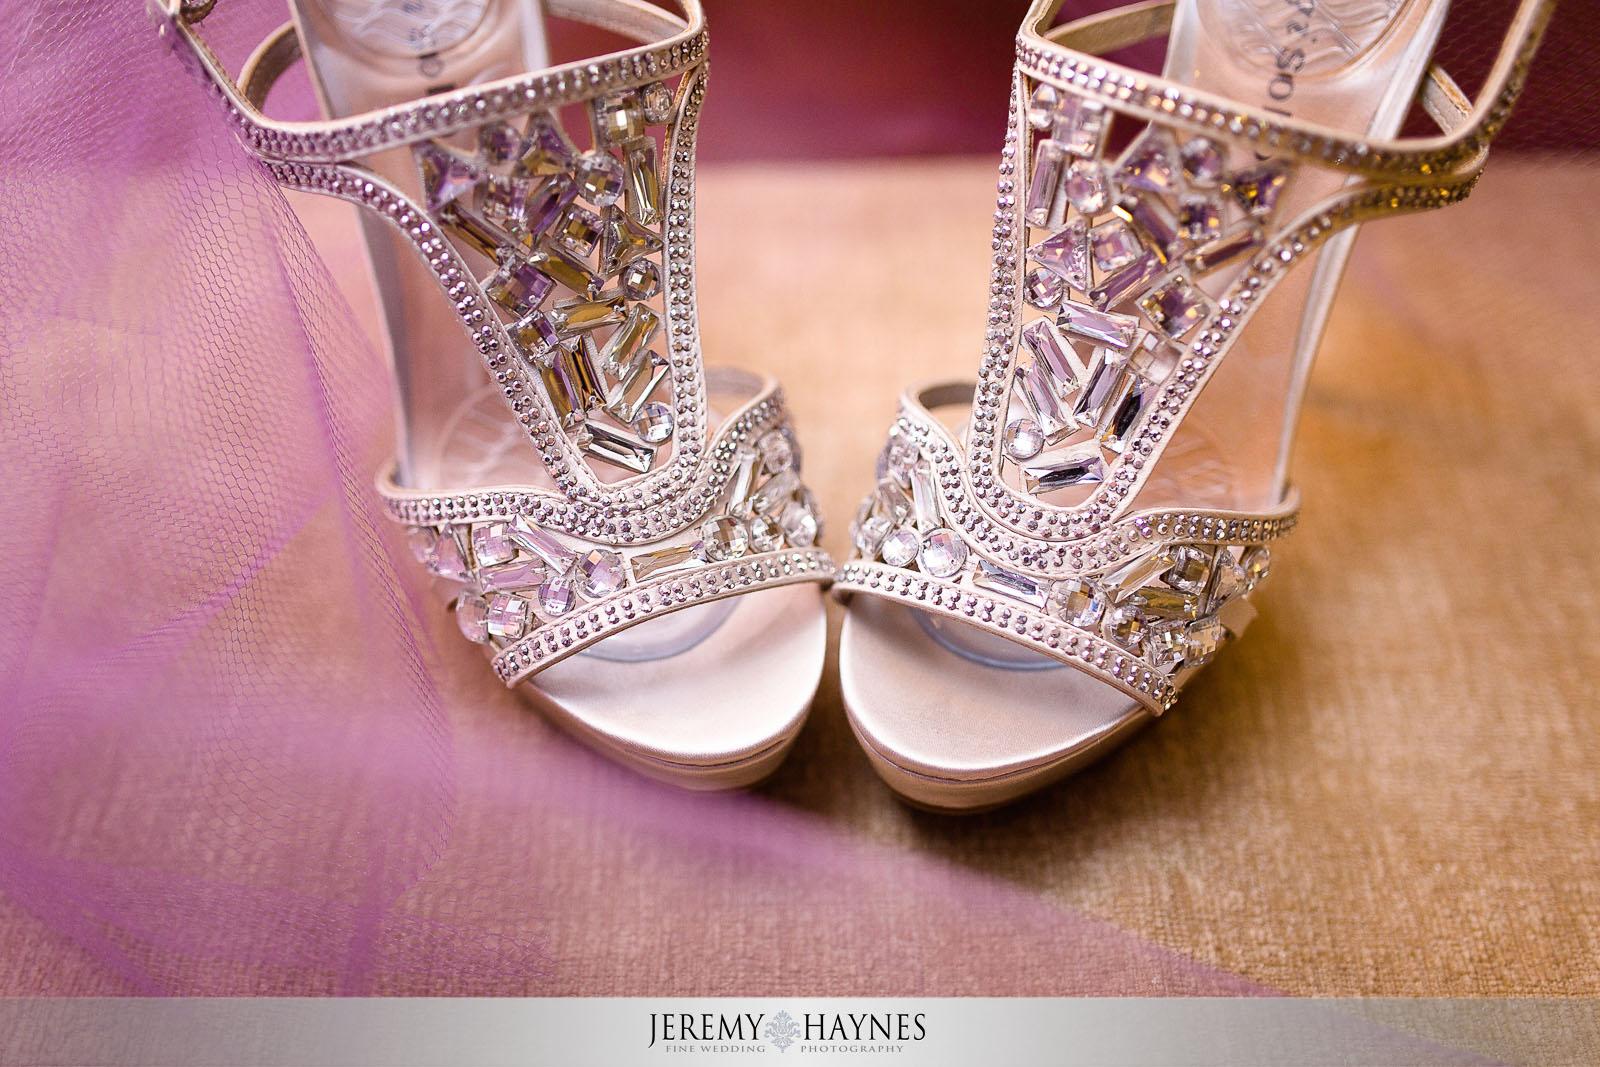 avon-wedding-details-bride-shoes